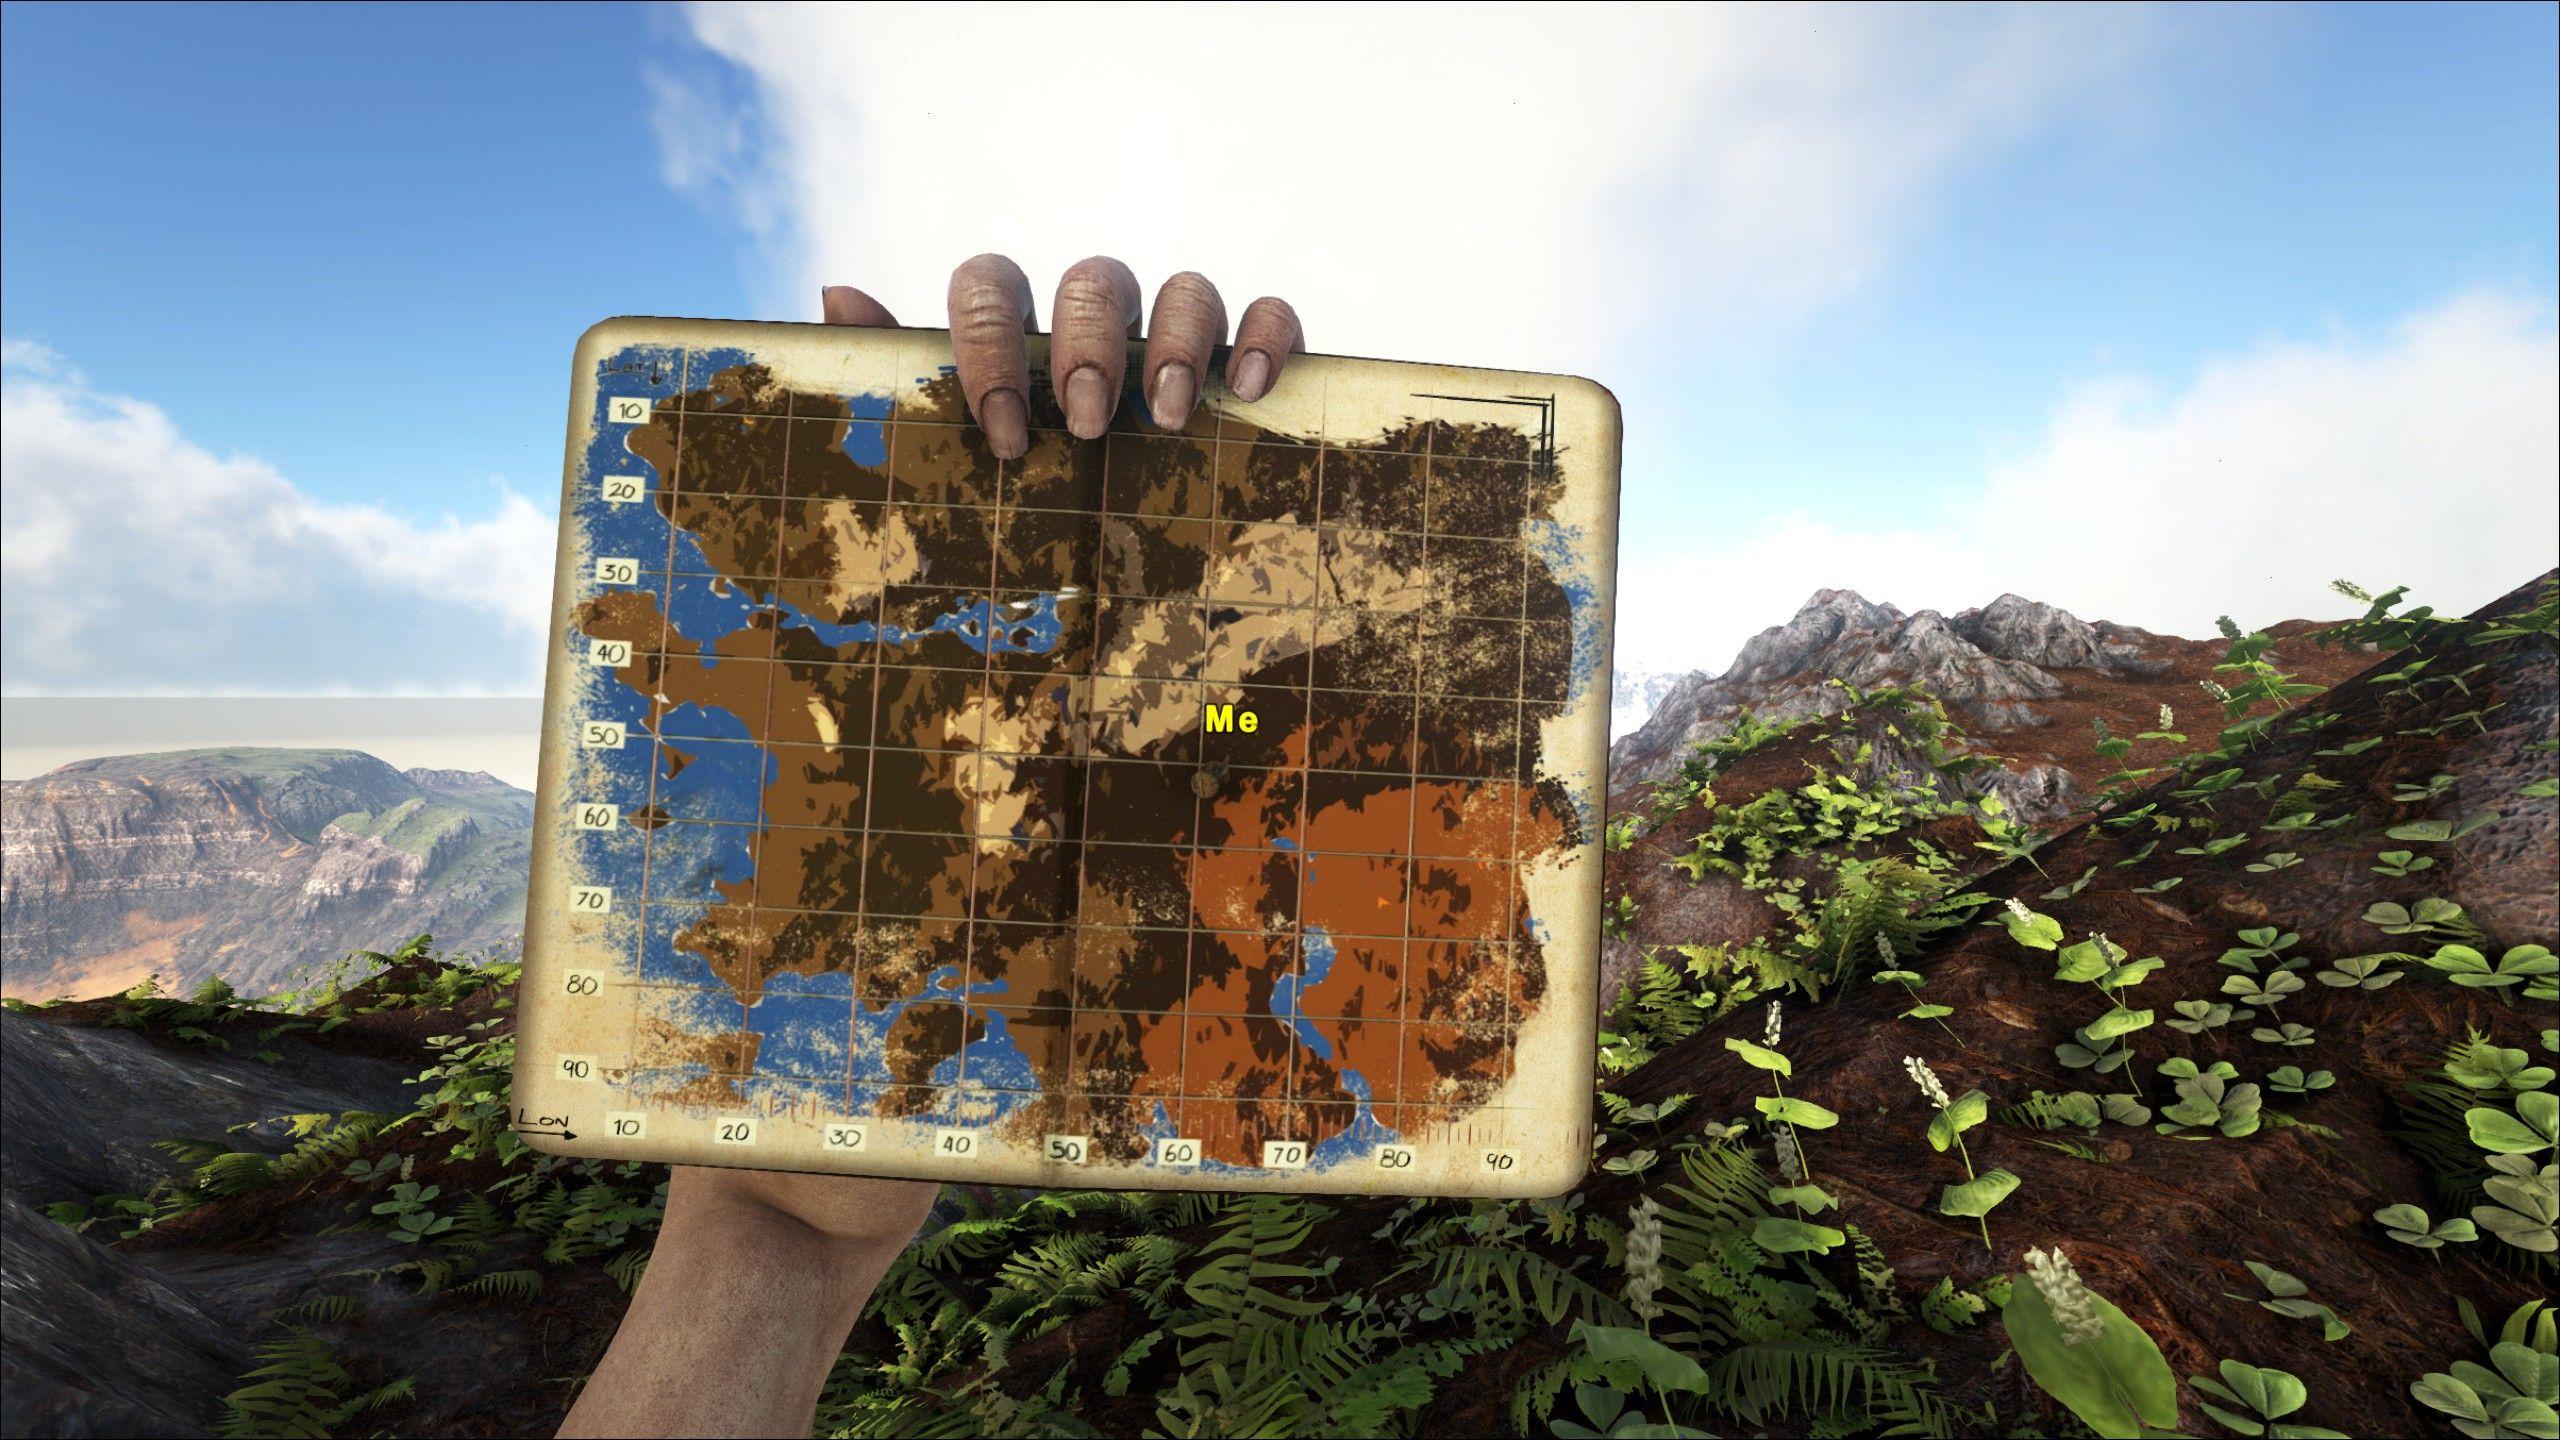 Ragnarok Map Ark Survival Evolved Landscape Ragnarok Map